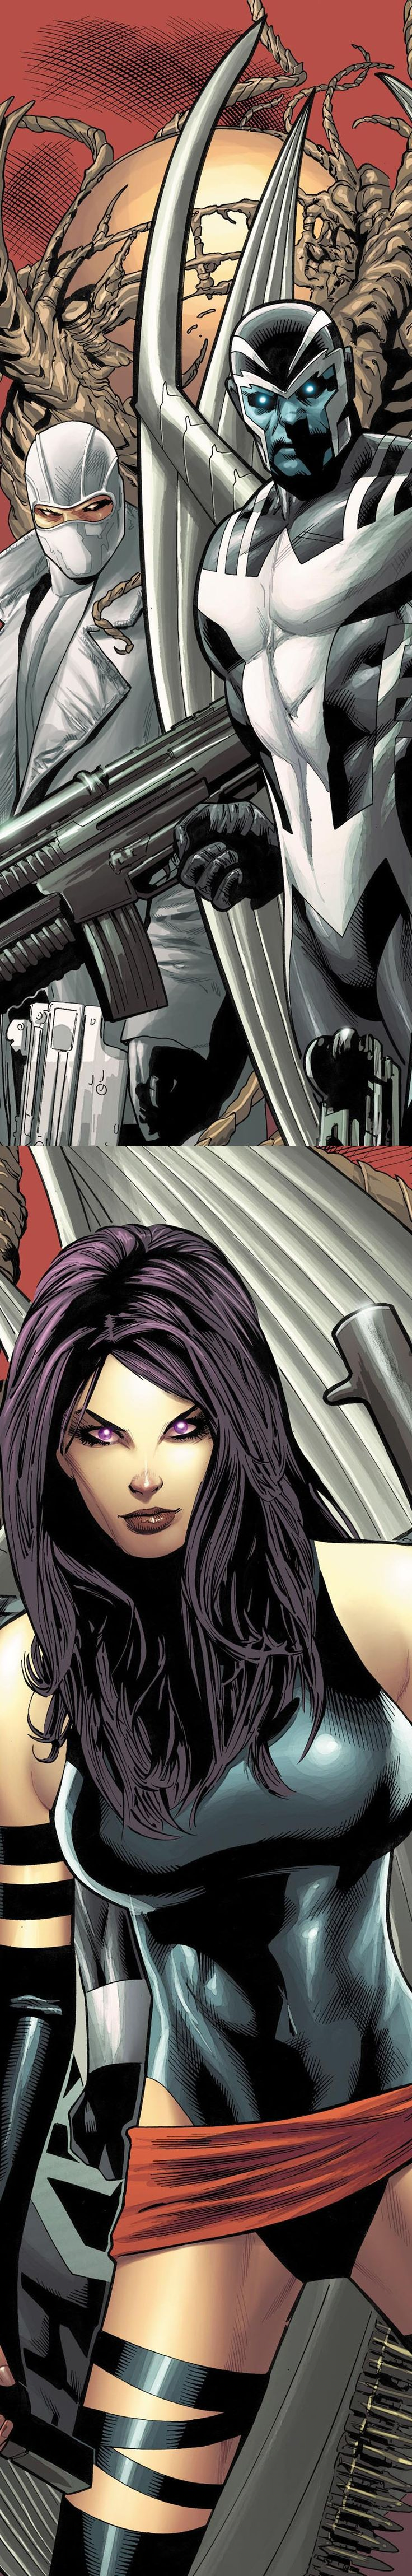 Psylocke & Archangel  Auction your comics on http://www.comicbazaar.co.uk